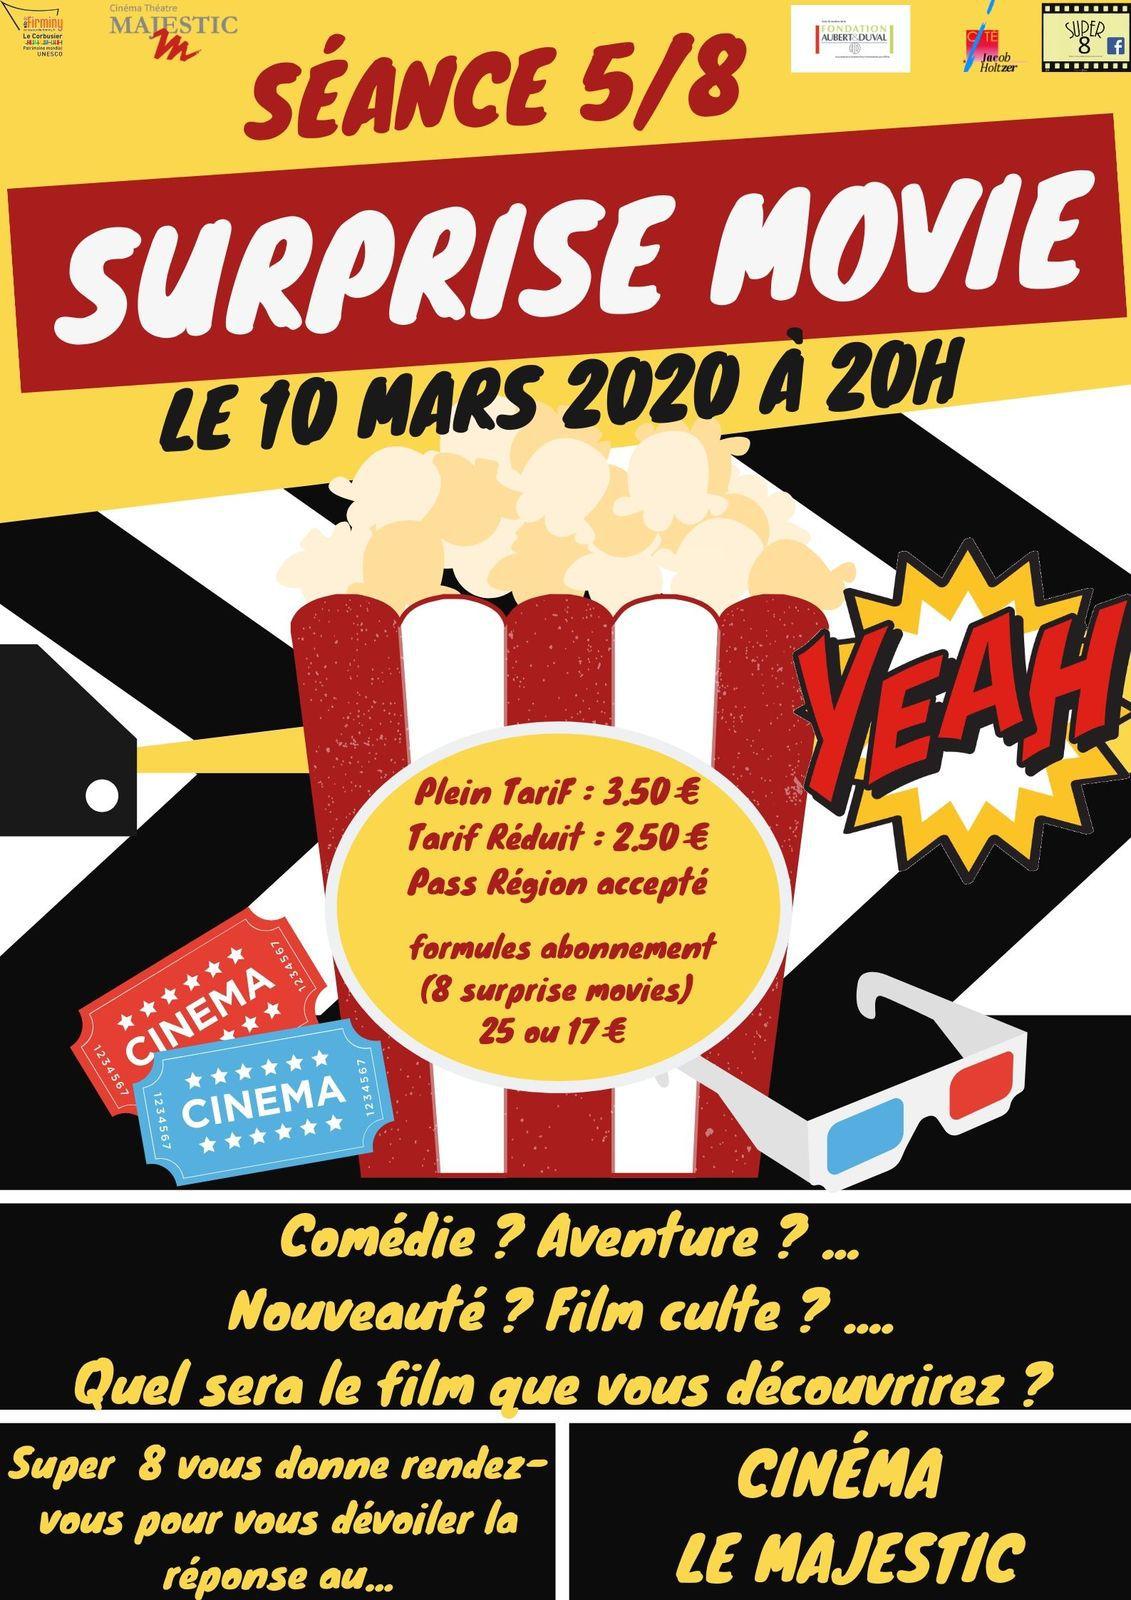 Surprise Movie 5/8 : les indices